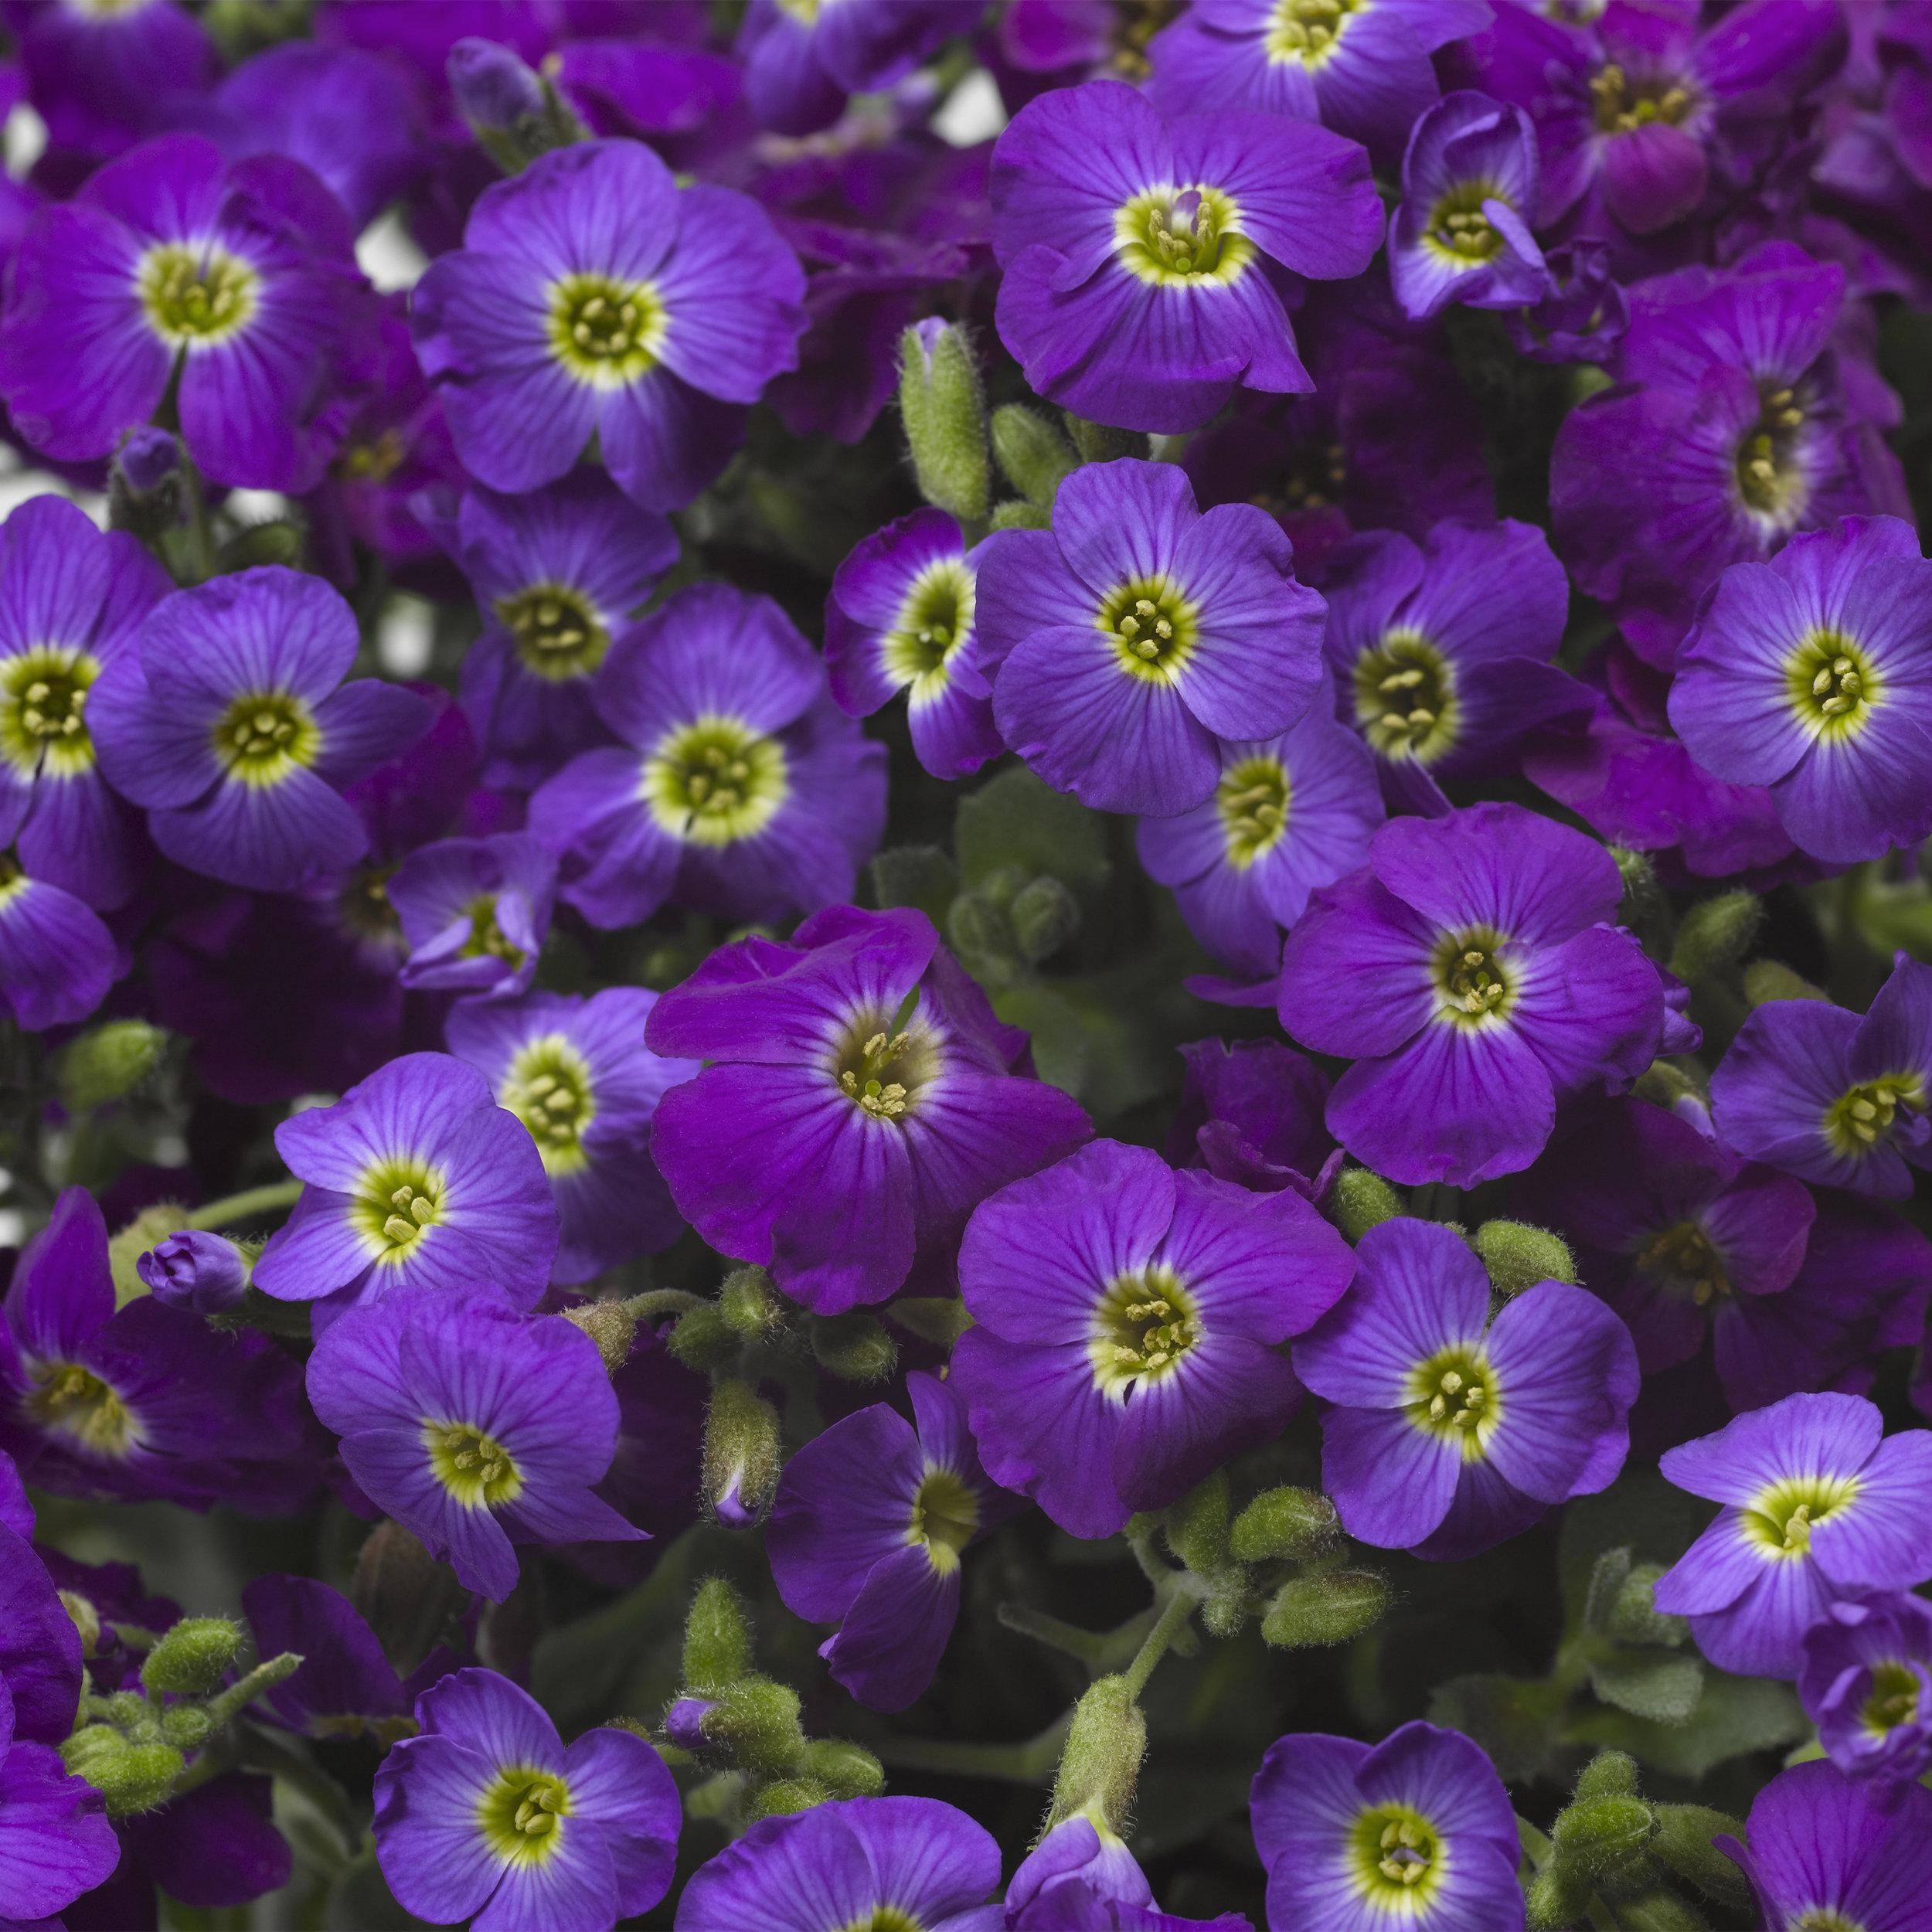 HR_Vegetative_Aubrieta_Axcent™_Axcent™_Violet_with_Eye_Imp._70028026.jpg